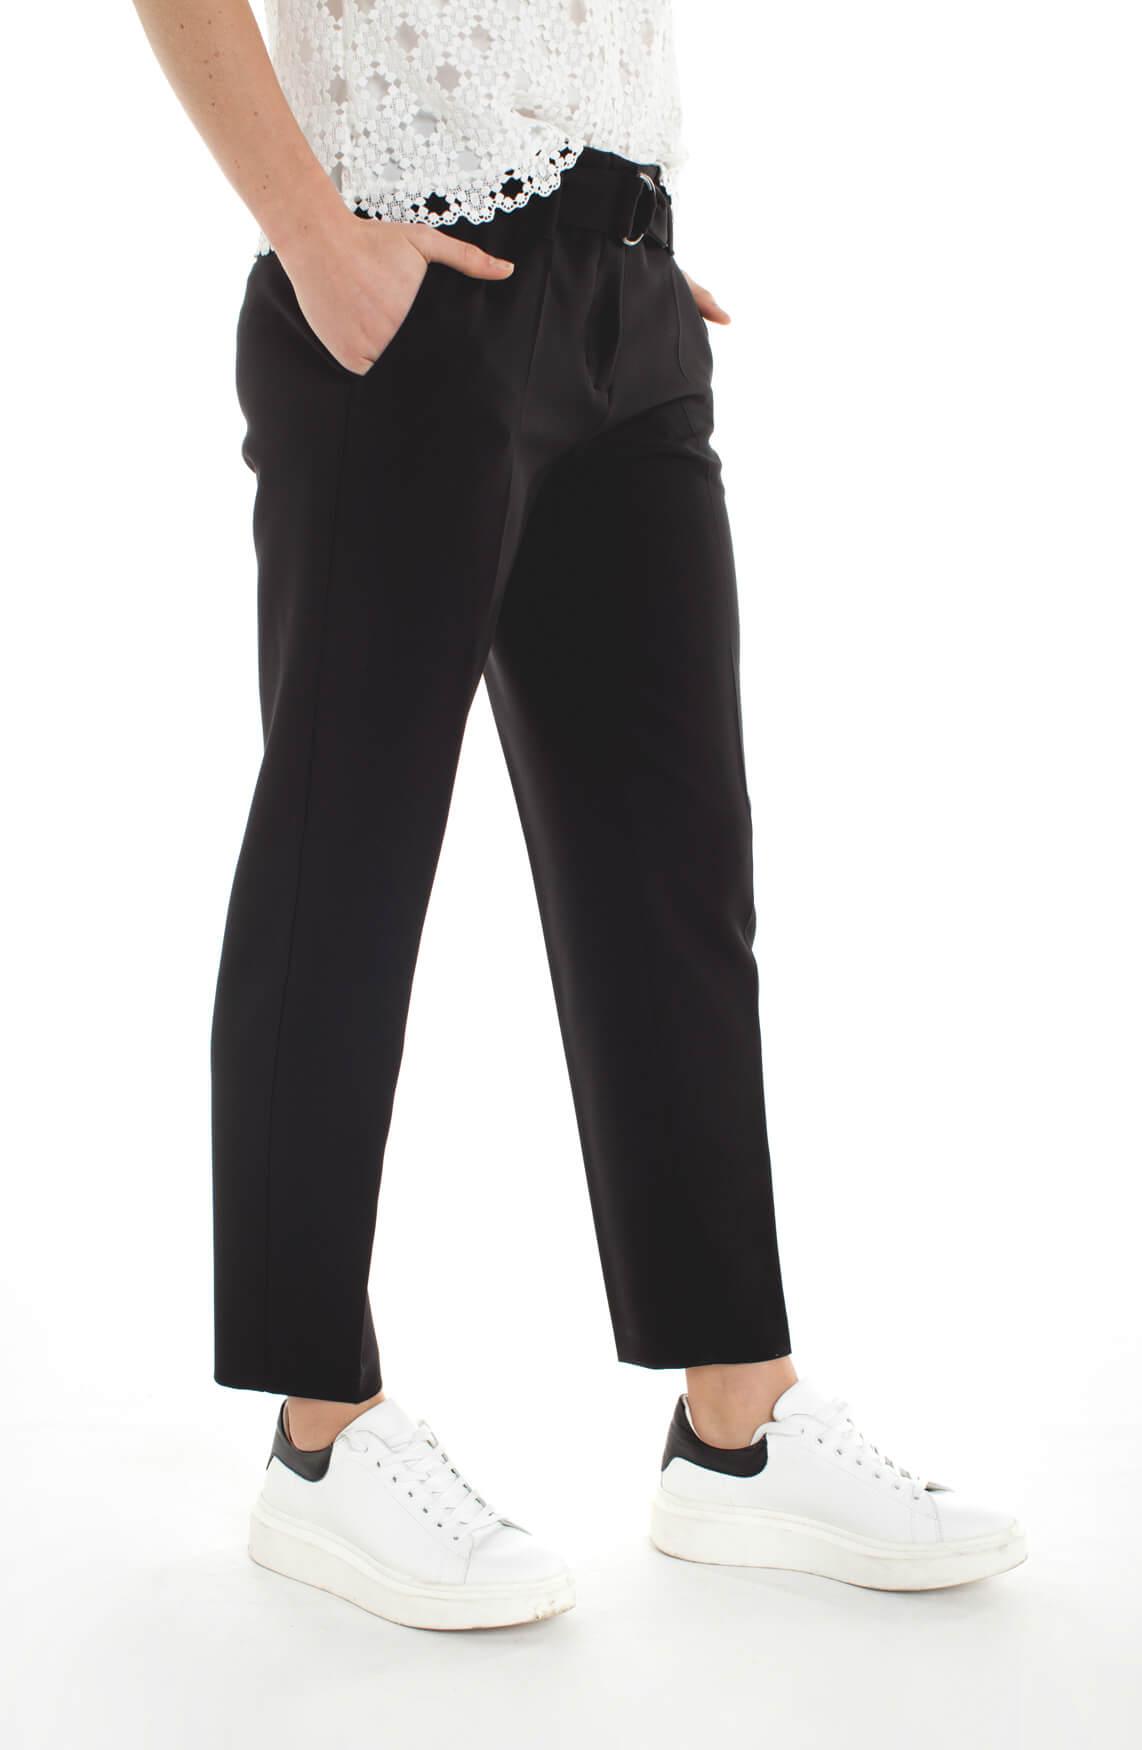 Cambio Dames Kaia pantalon met ceintuur zwart